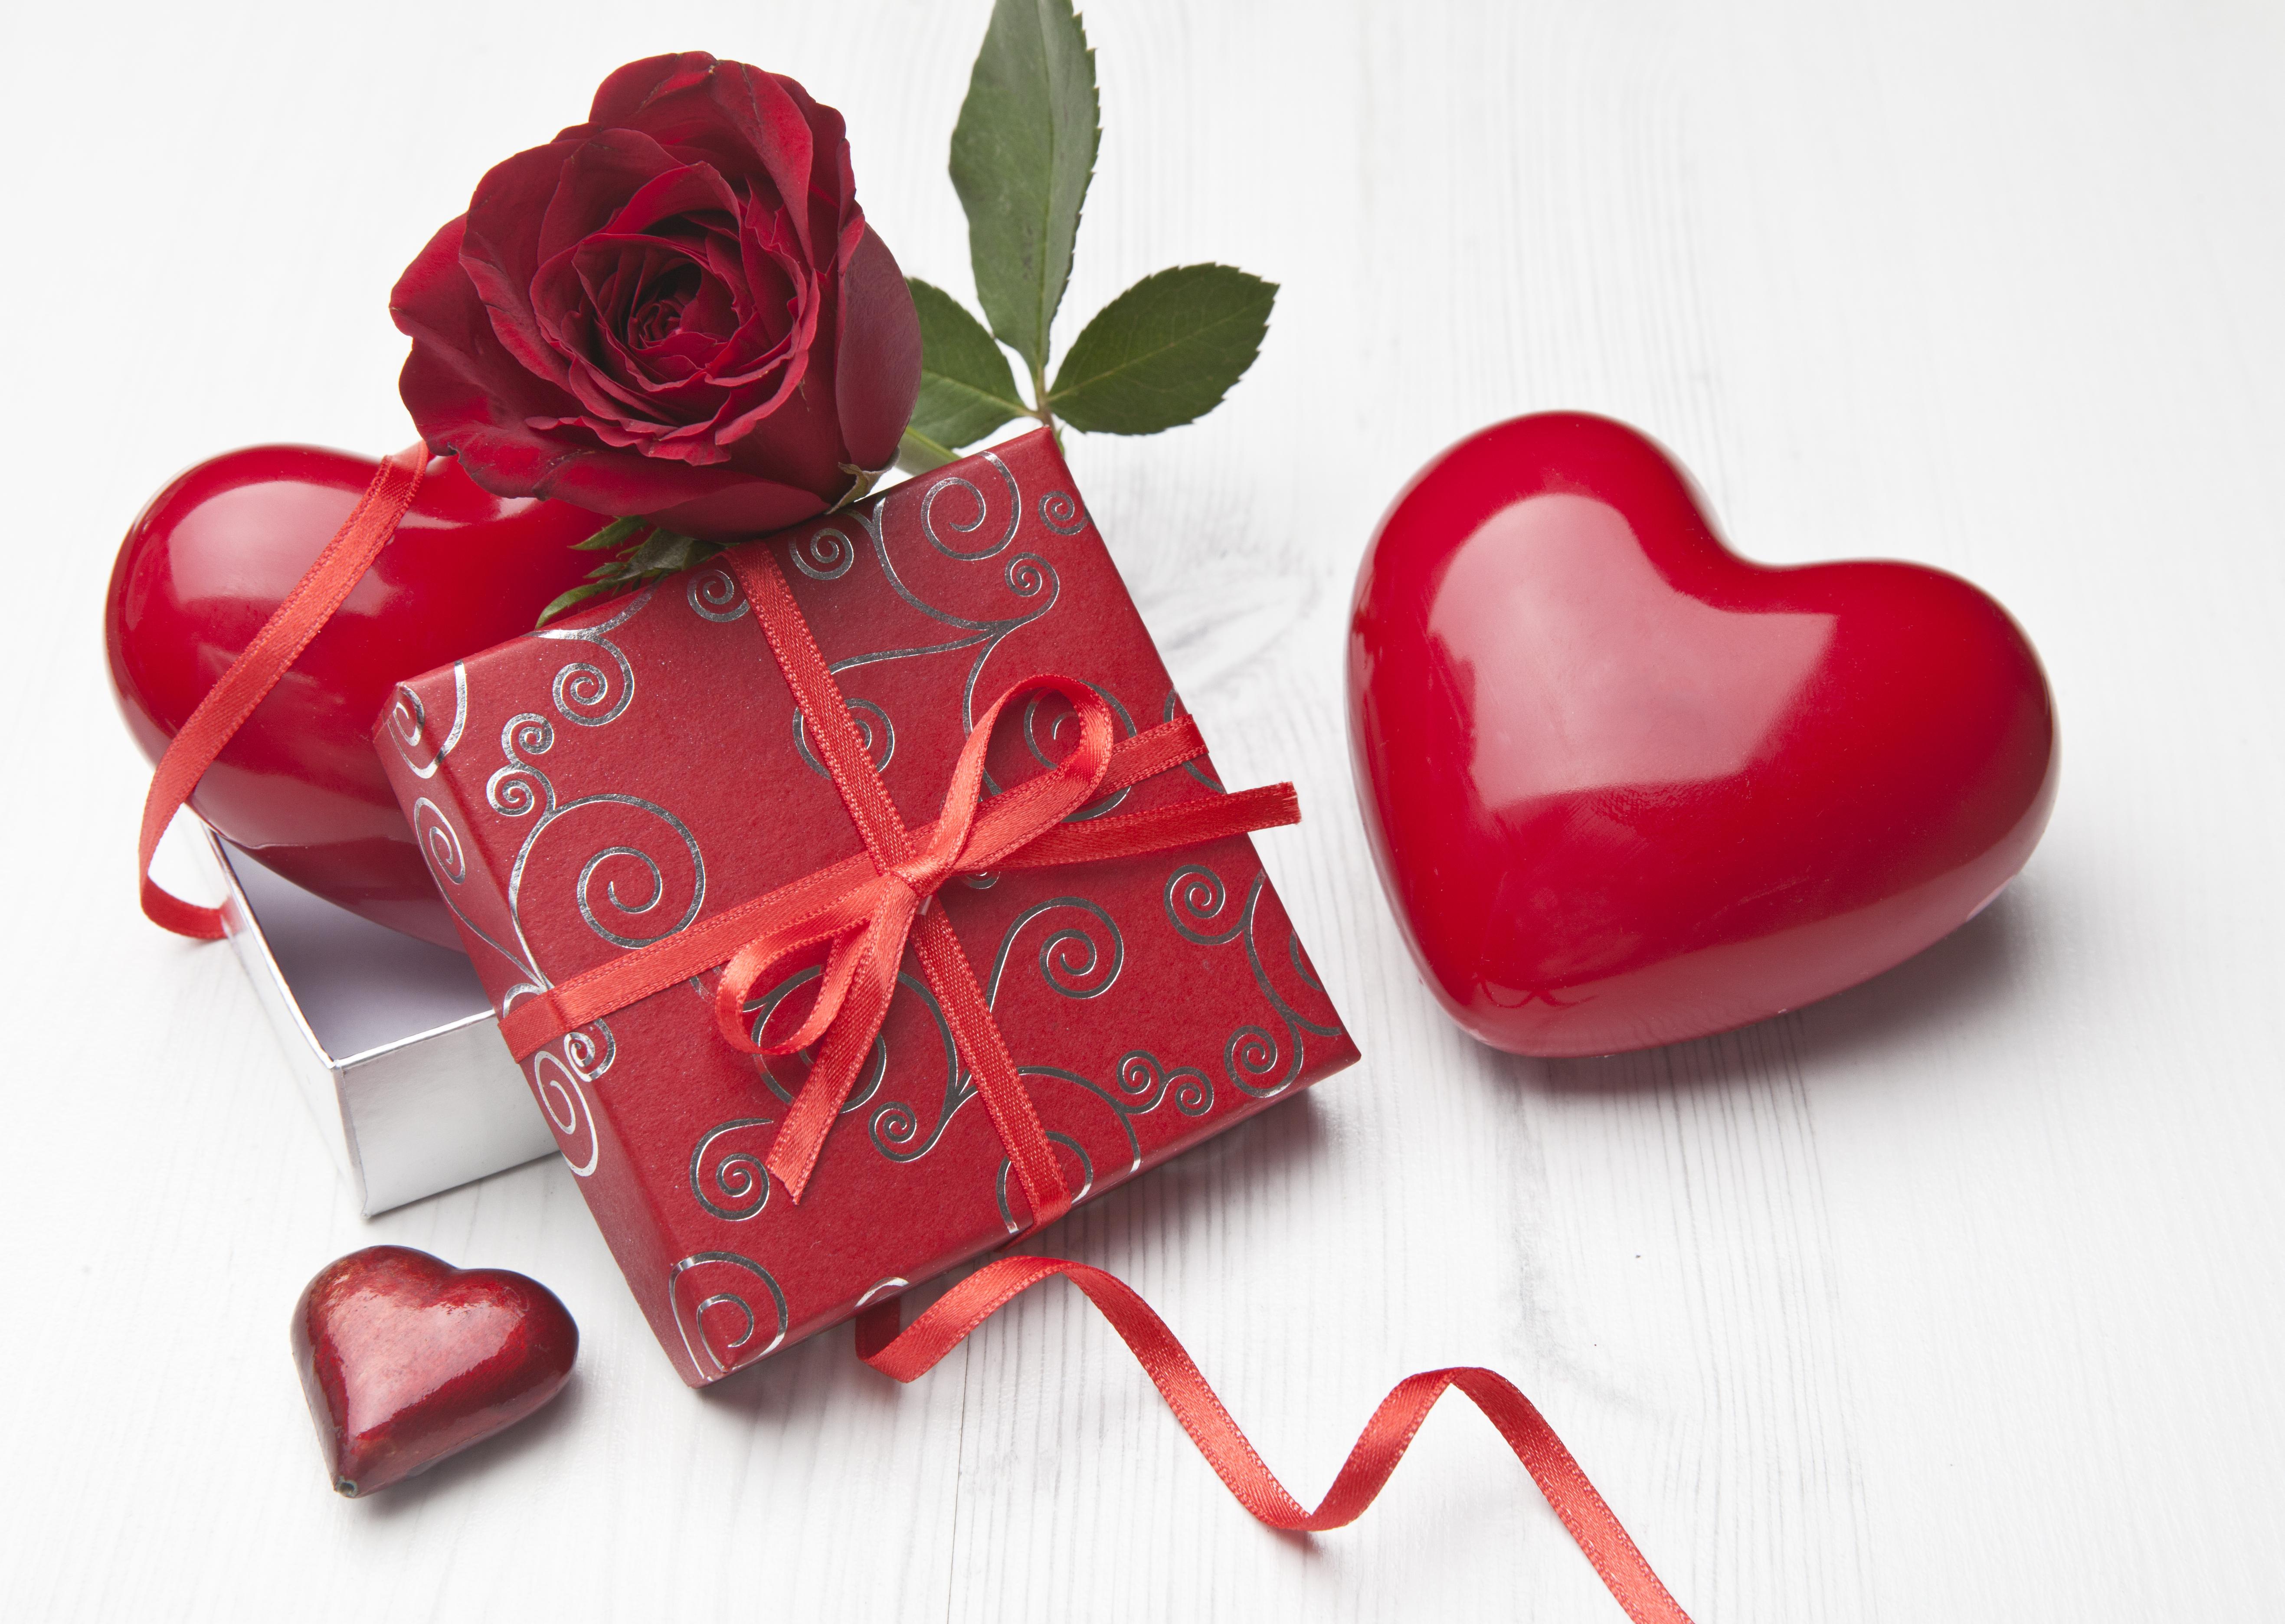 paperb valentine day gift - HD2560×1819